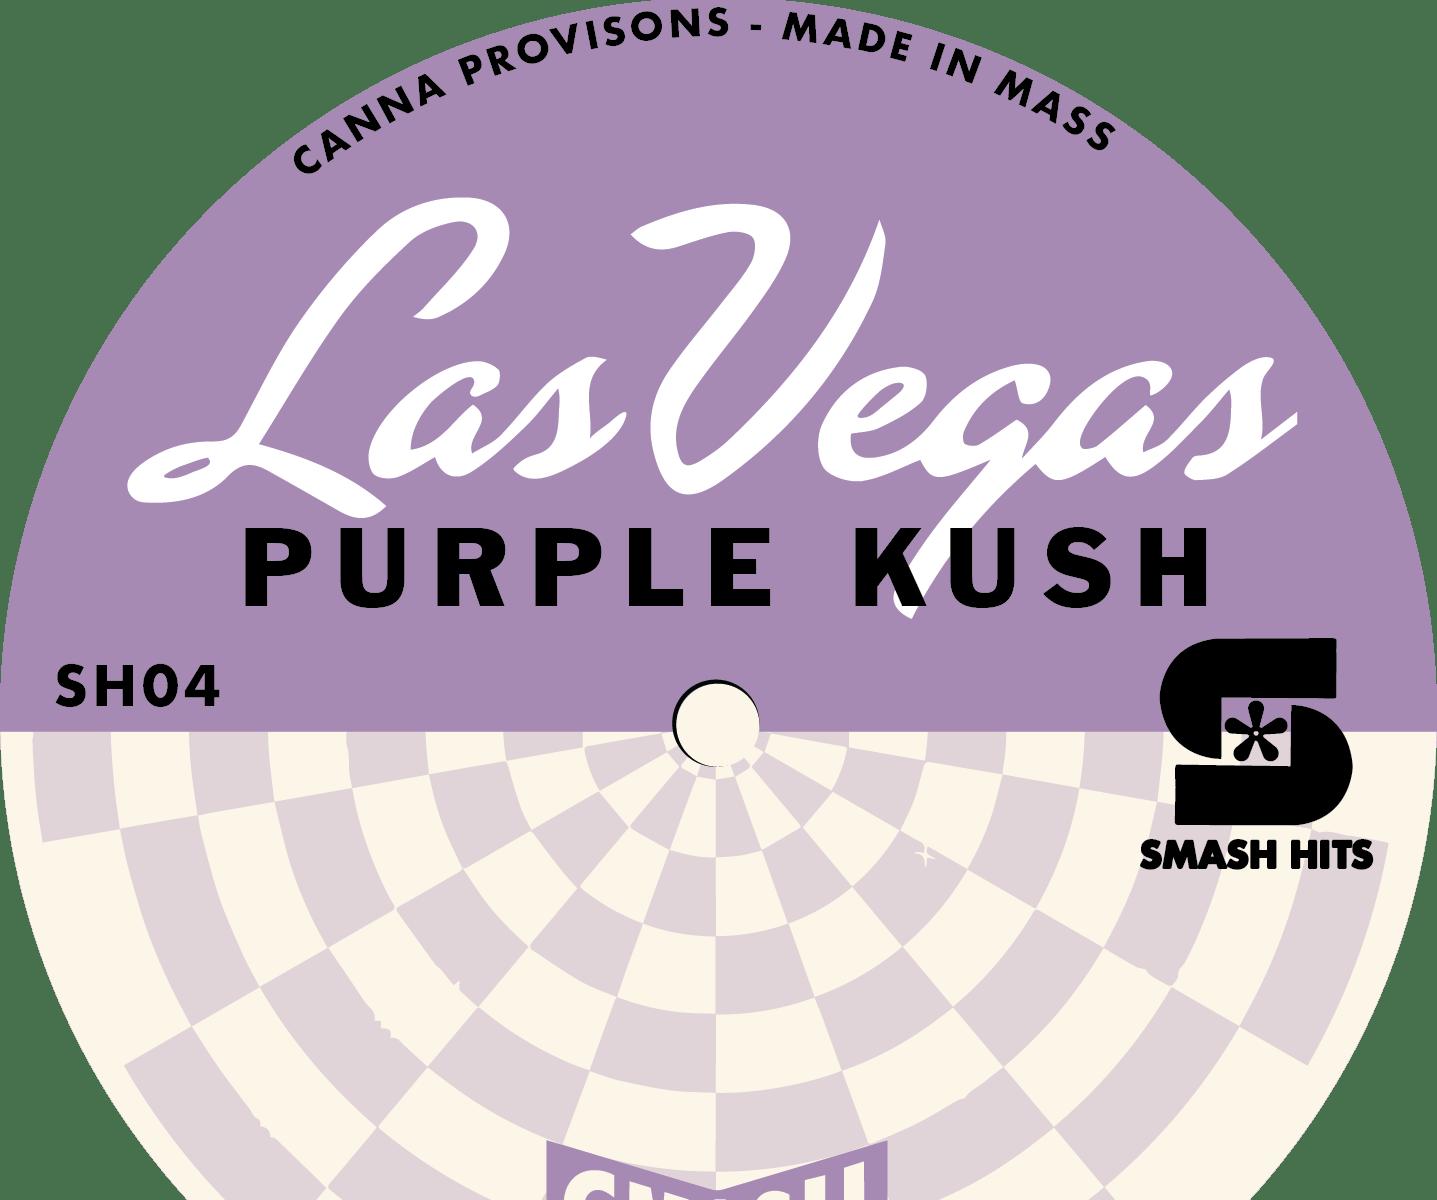 Las Vegas Purple Kush smash hits chemdog canna provisions